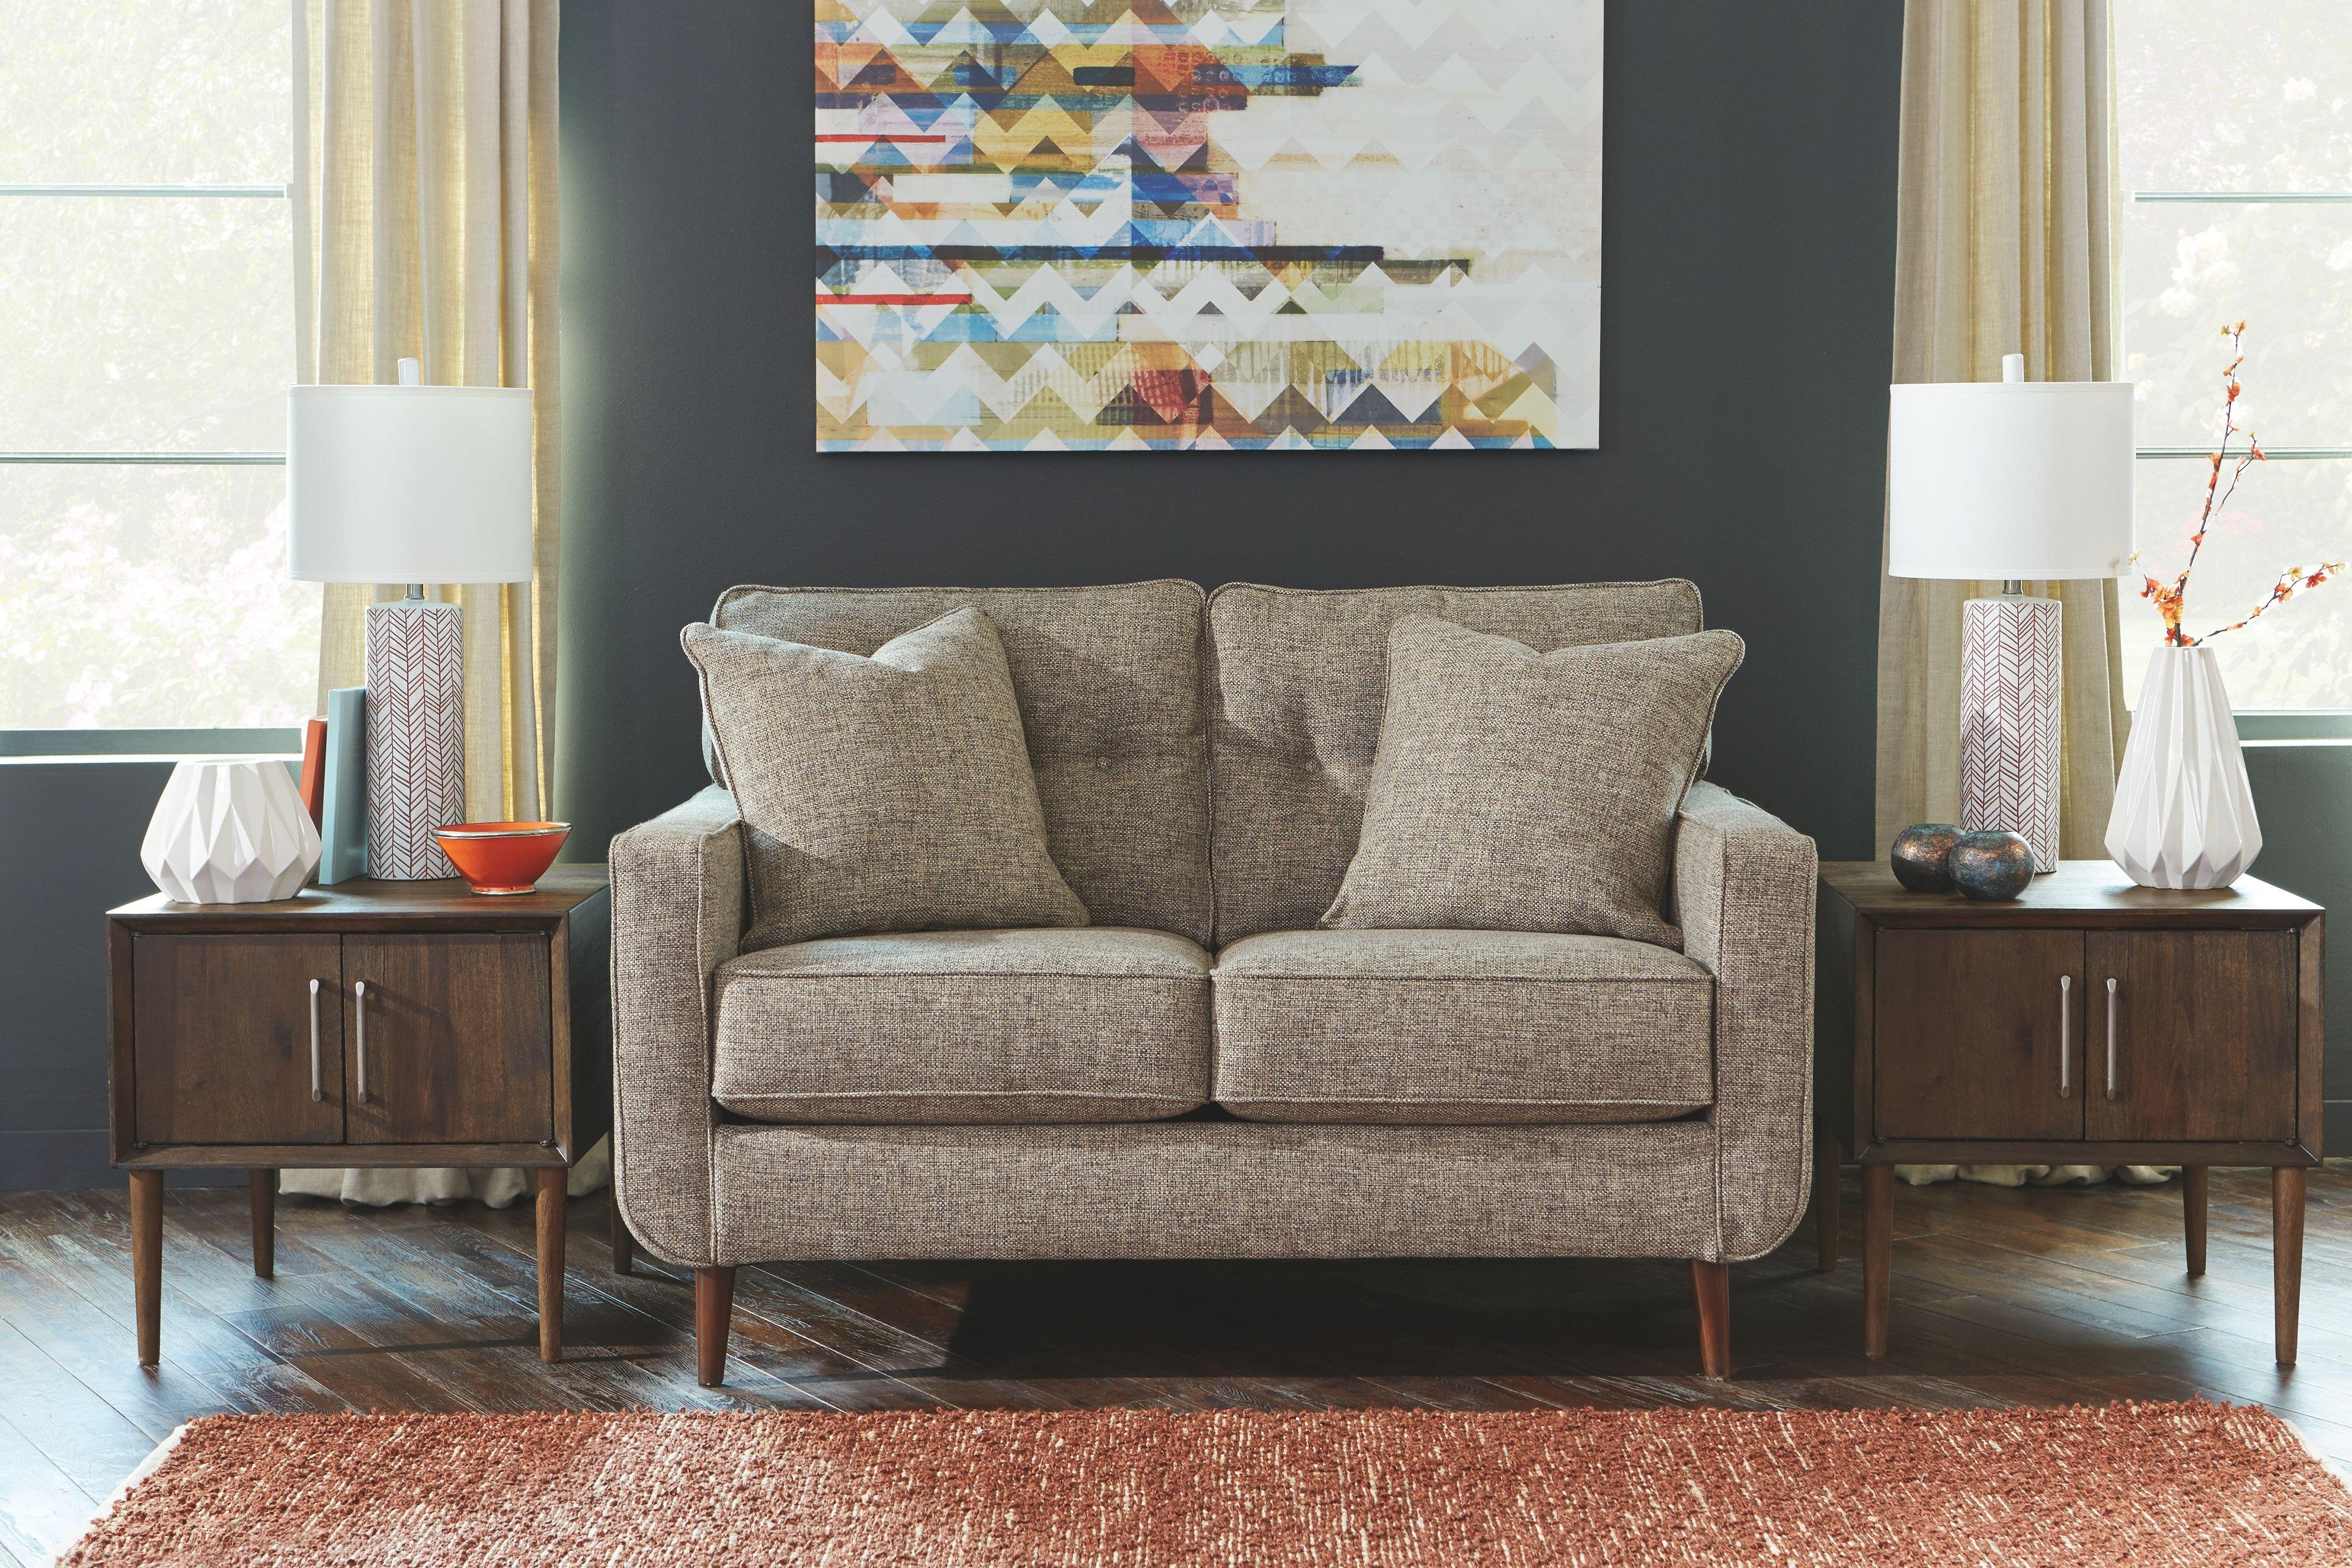 Living Room Loveseats China Towne Furniture Solvay NY